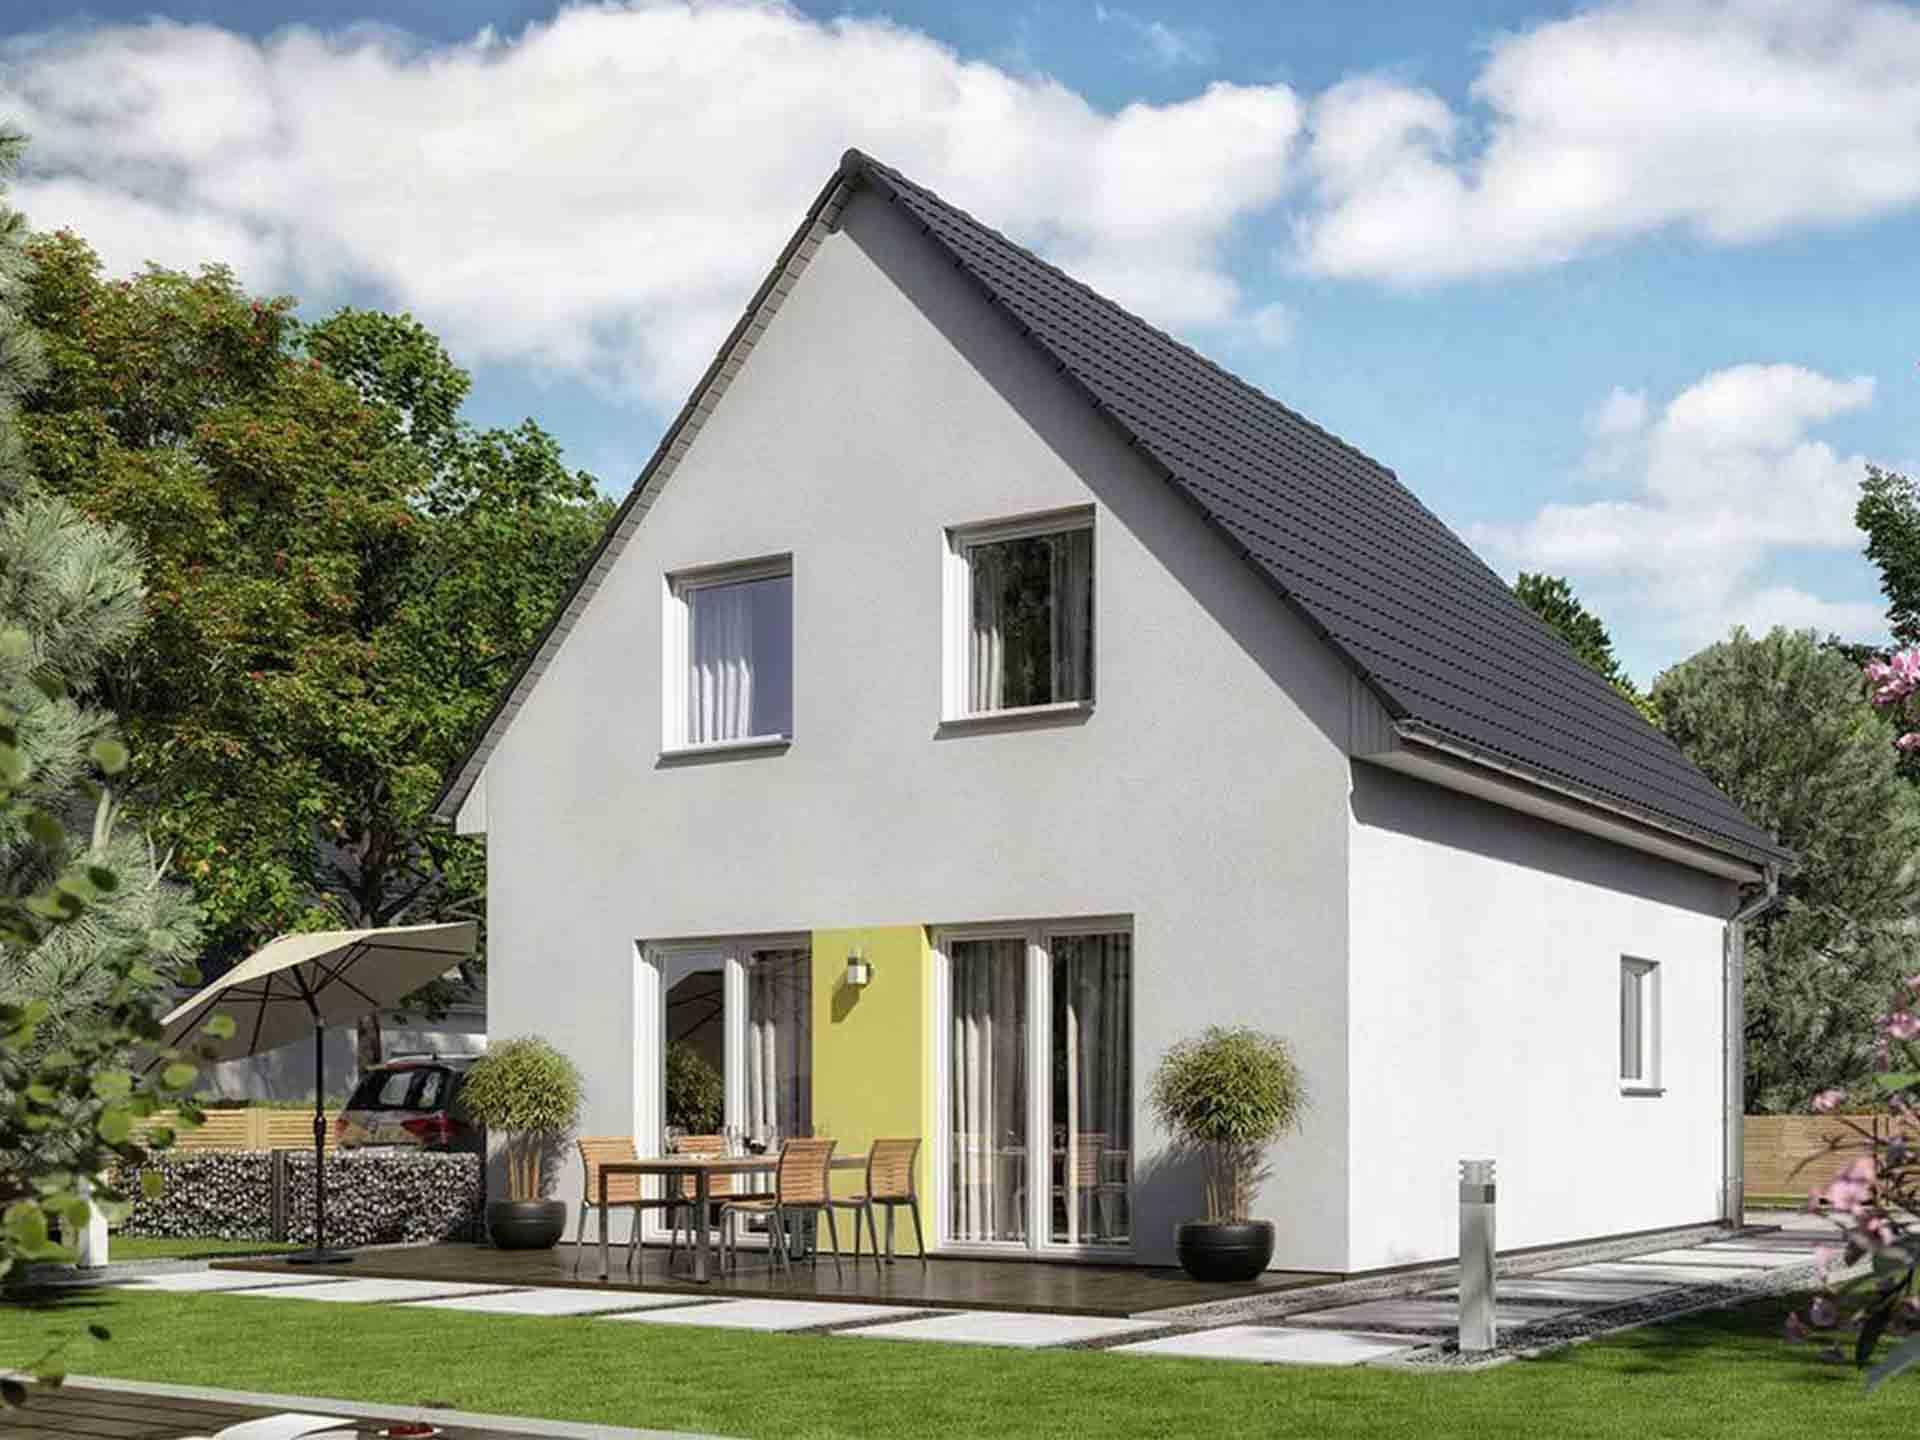 BauArt Massivbau - Town & Country - Einfamilienhaus Raumwunder 90